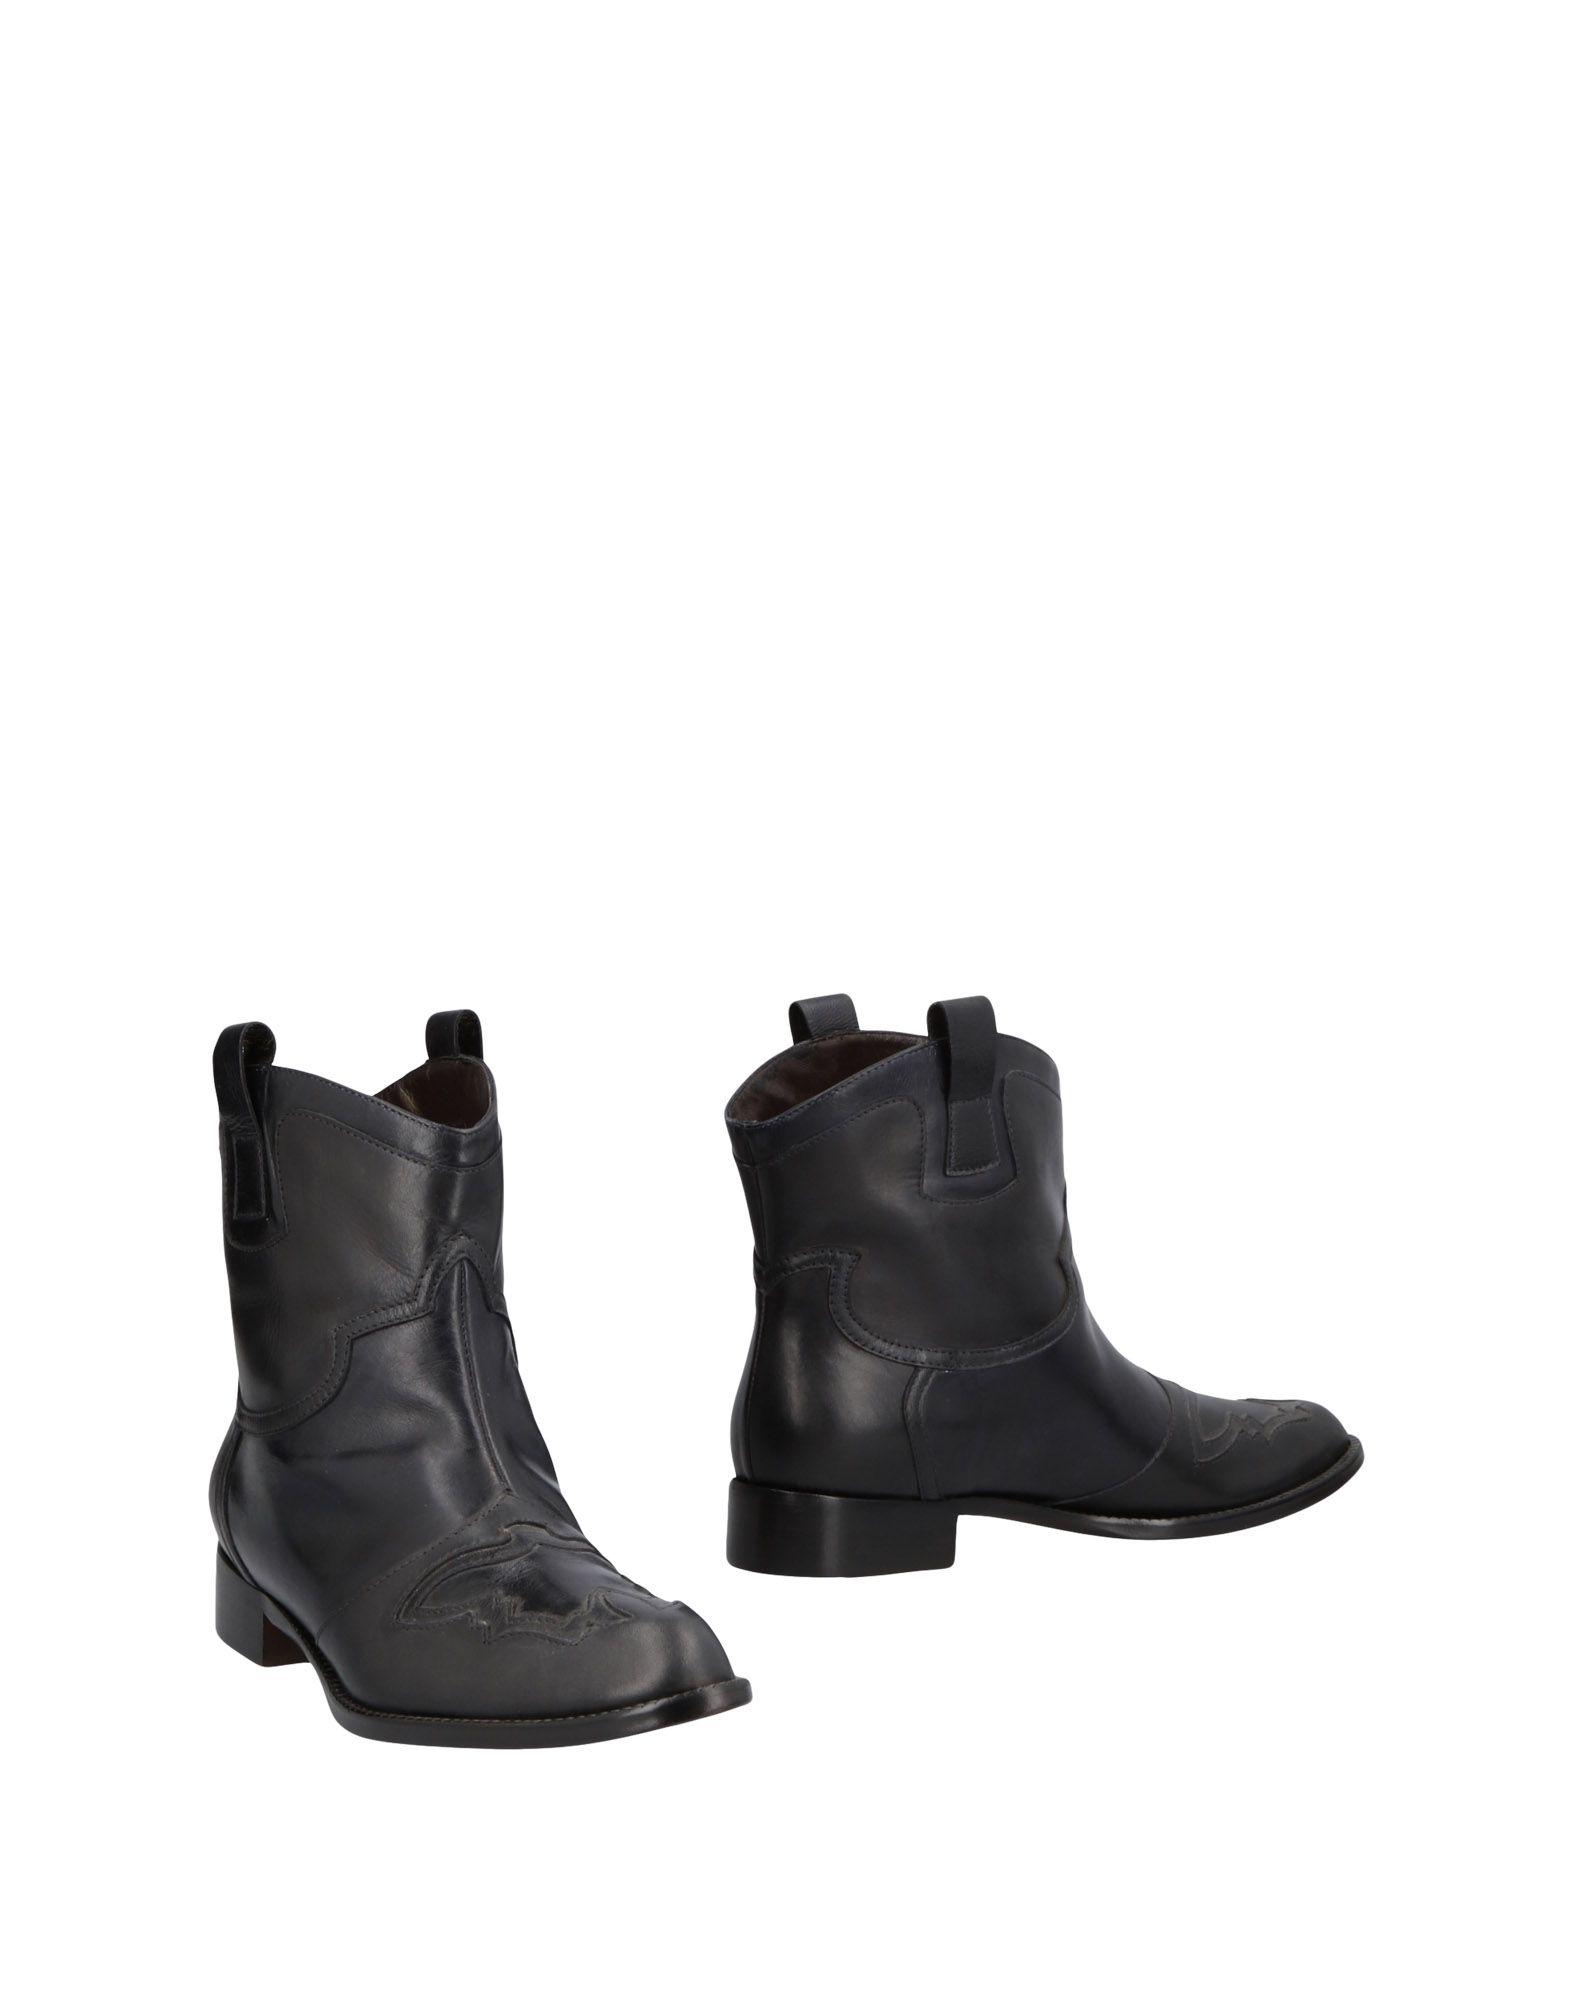 VICINI TAPEET Полусапоги и высокие ботинки цены онлайн